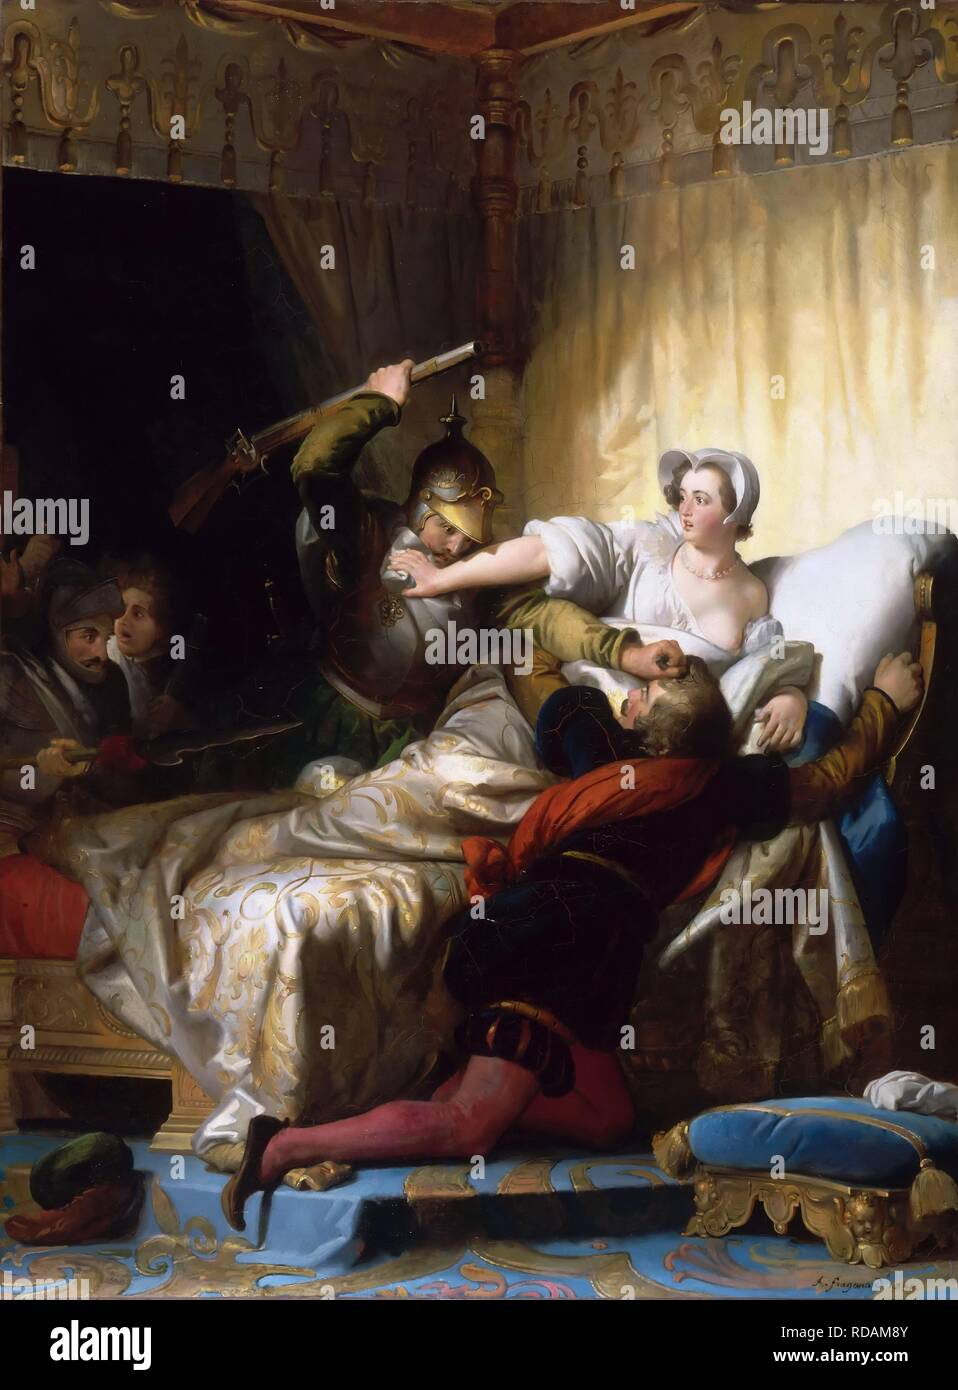 Scene in the bedroom of Marguerite de Valois during the St. Bartholomew's Day massacre. Museum: Musee du Louvre, Paris. Author: FRAGONARD, ALEXANDRE-EVARISTE. Stock Photo